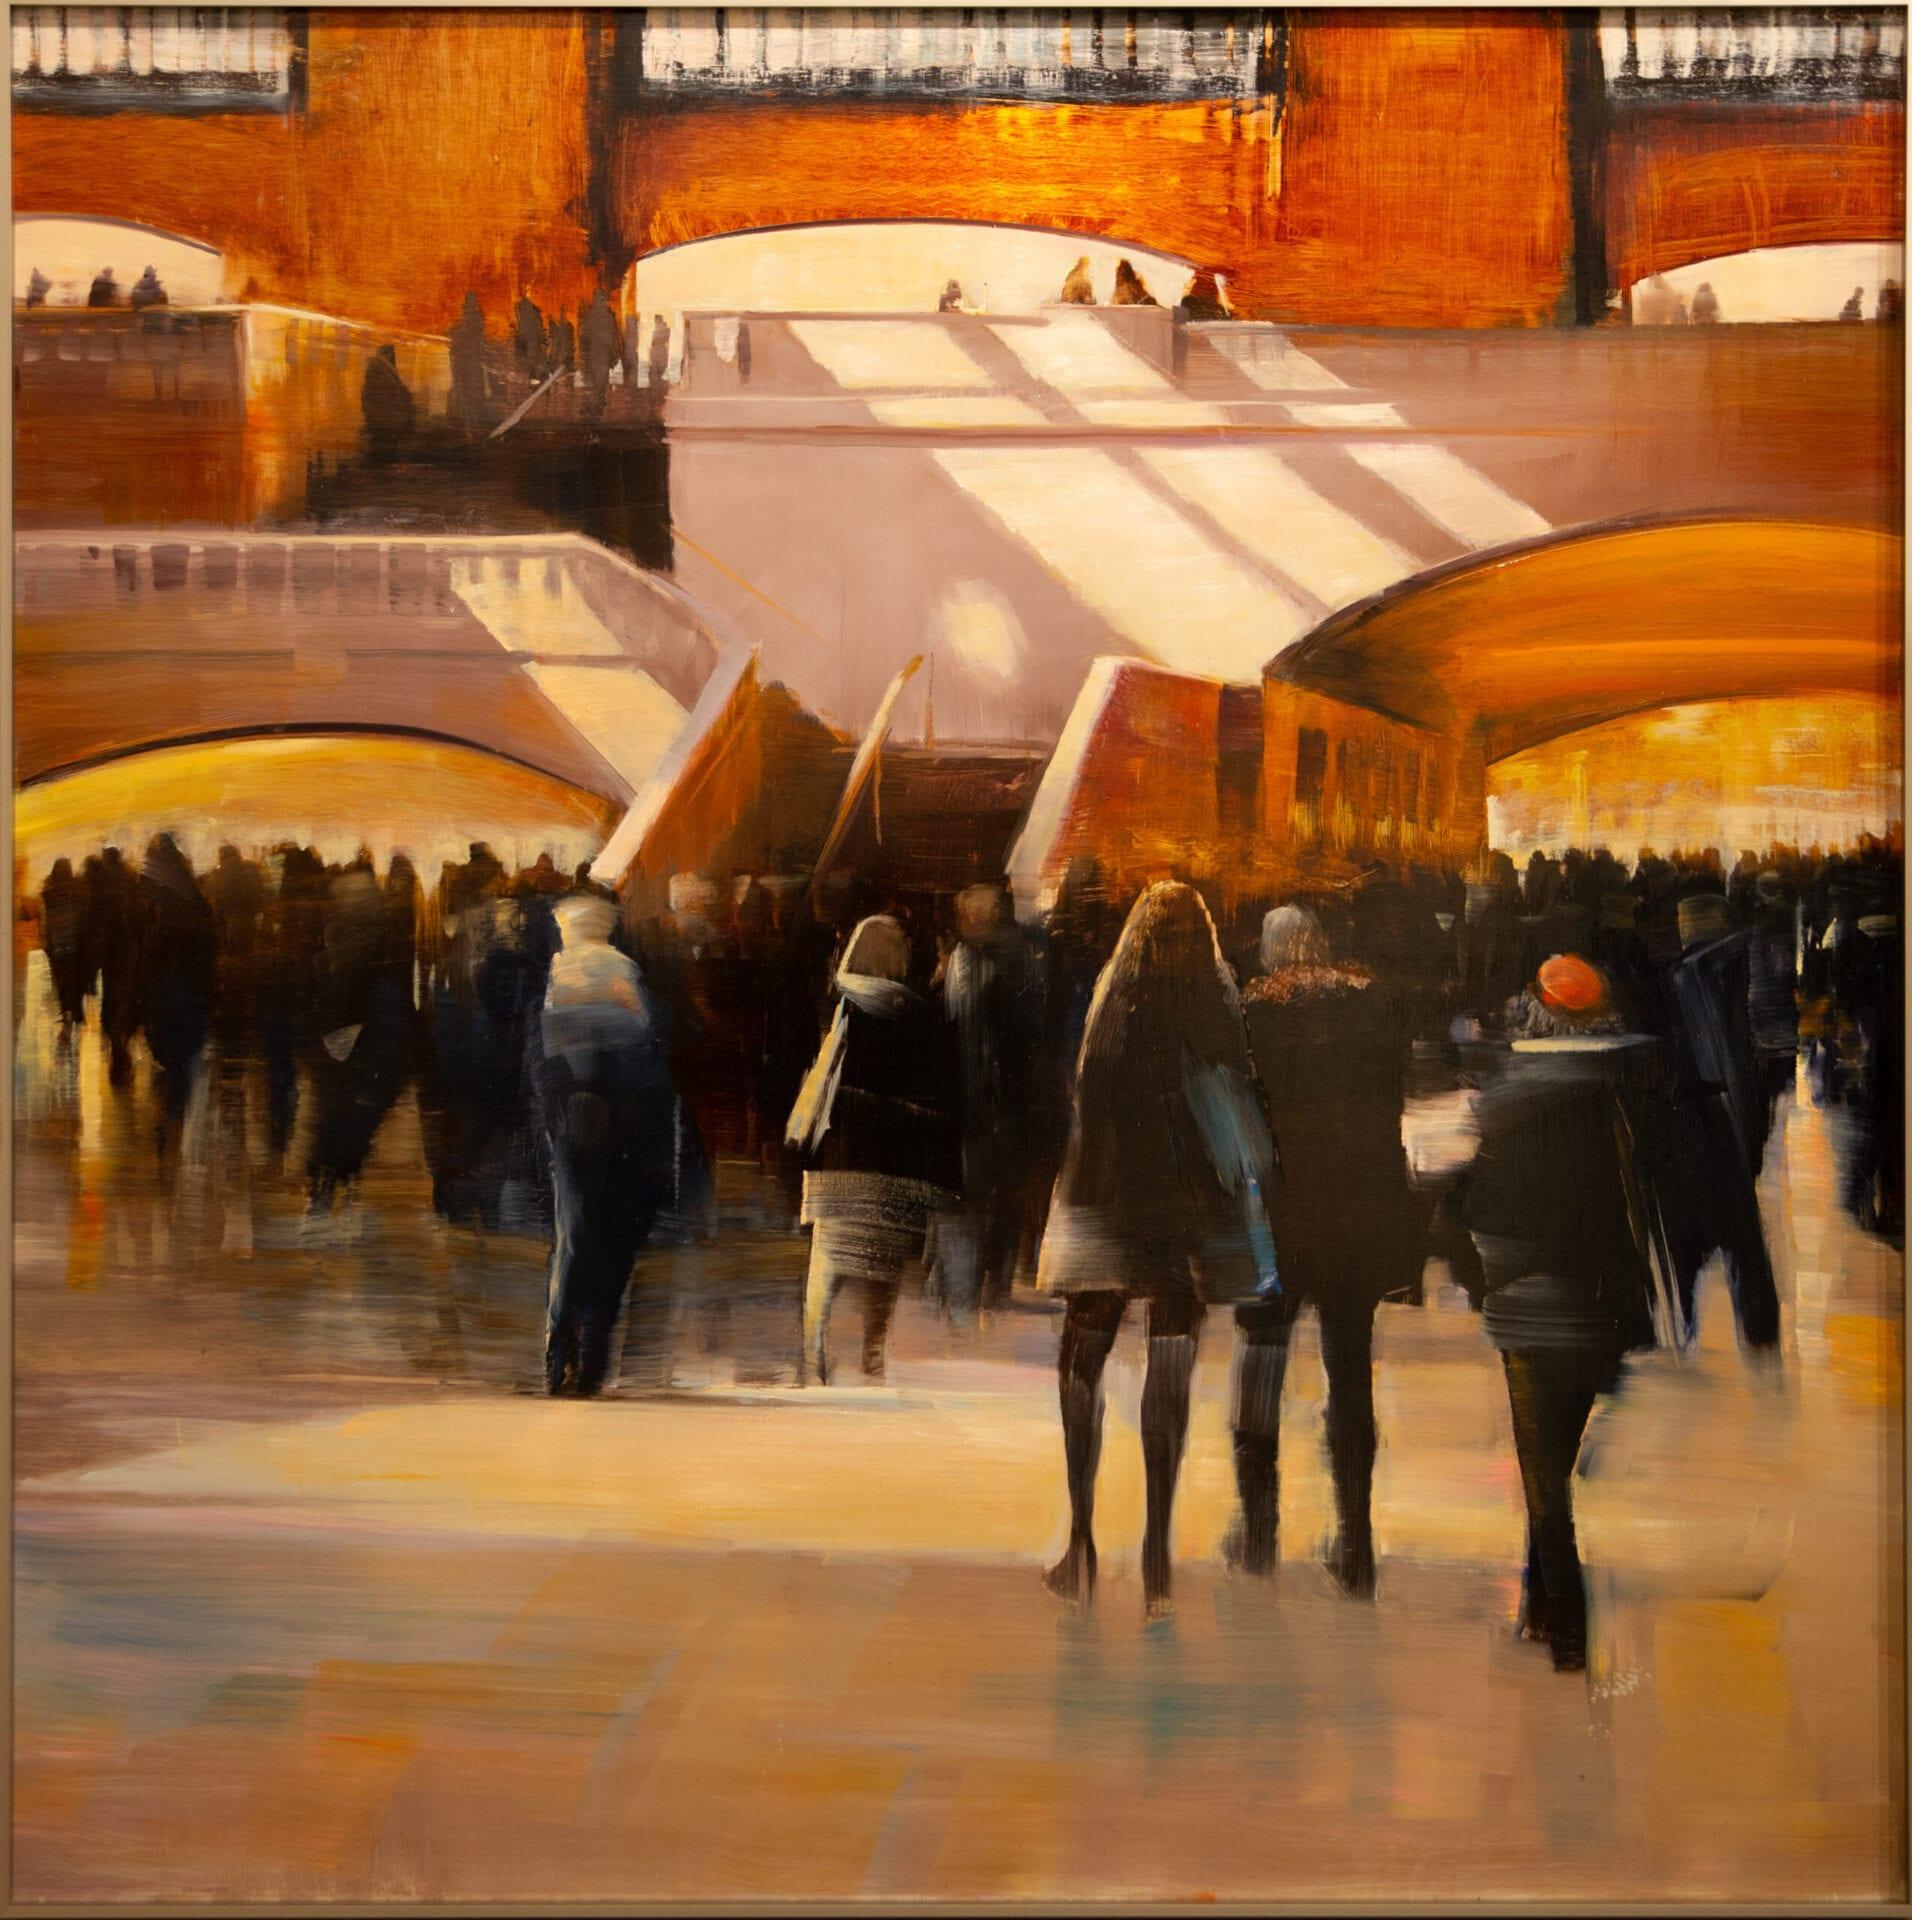 David Dunlop - Grand Central Station, Sun Stripes